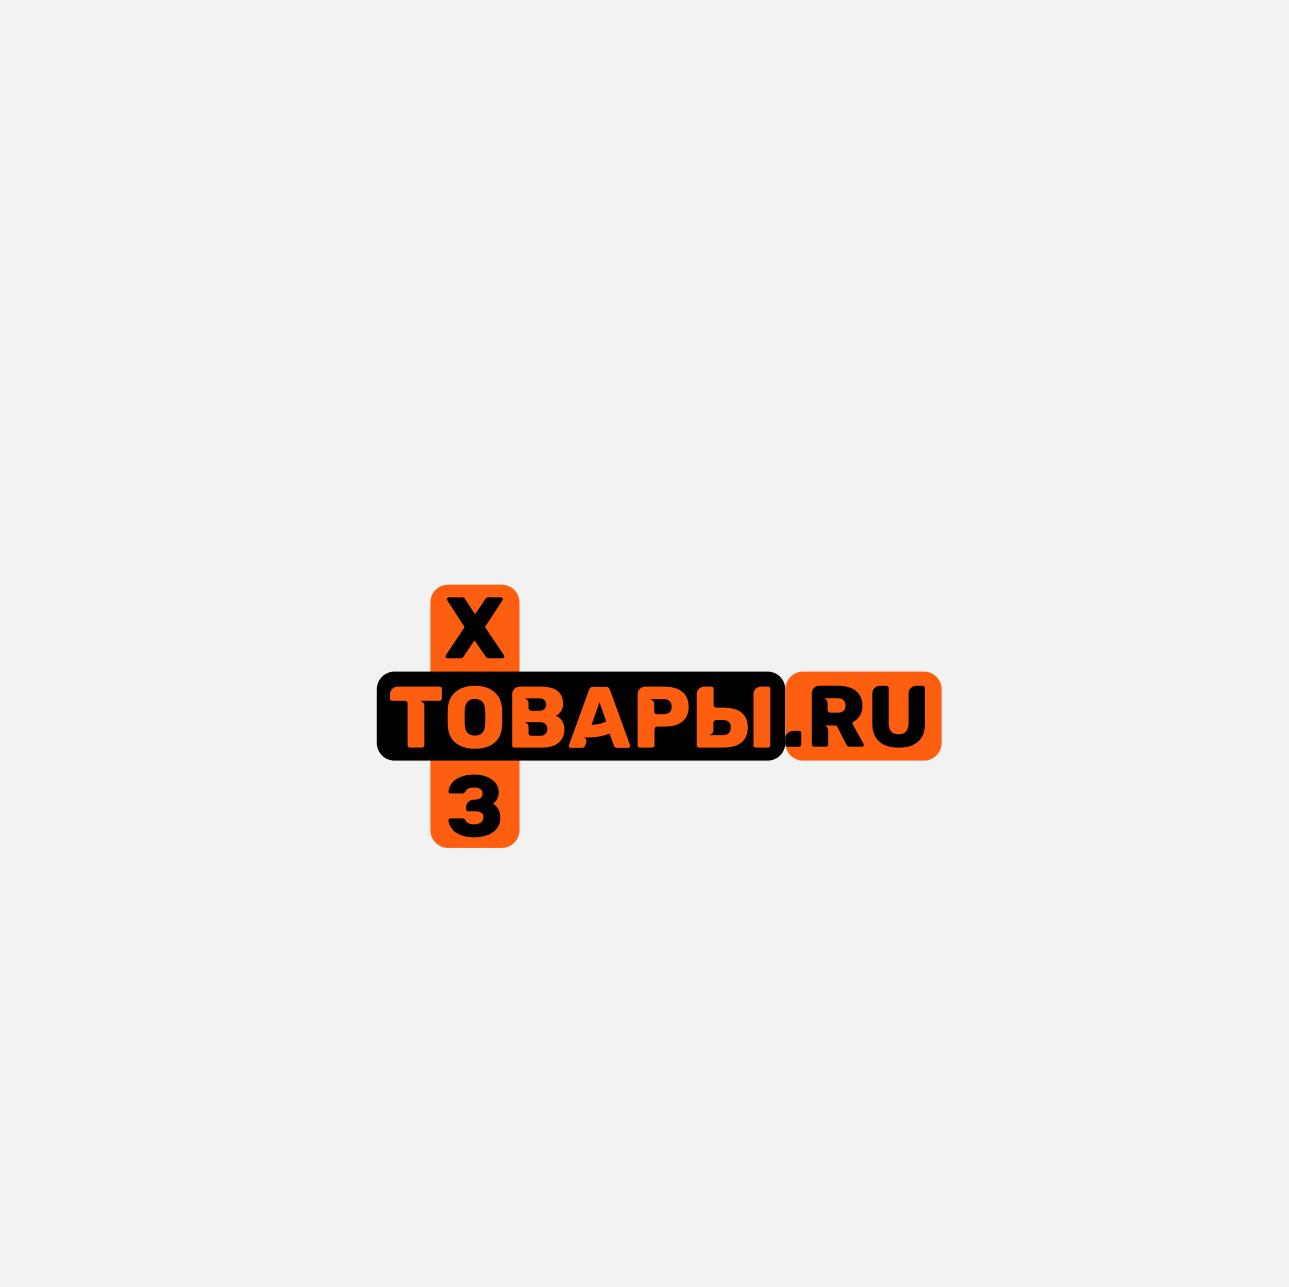 Разработка логотипа для оптового интернет-магазина «Хозтовары.ру» фото f_299607091ce14f6a.png